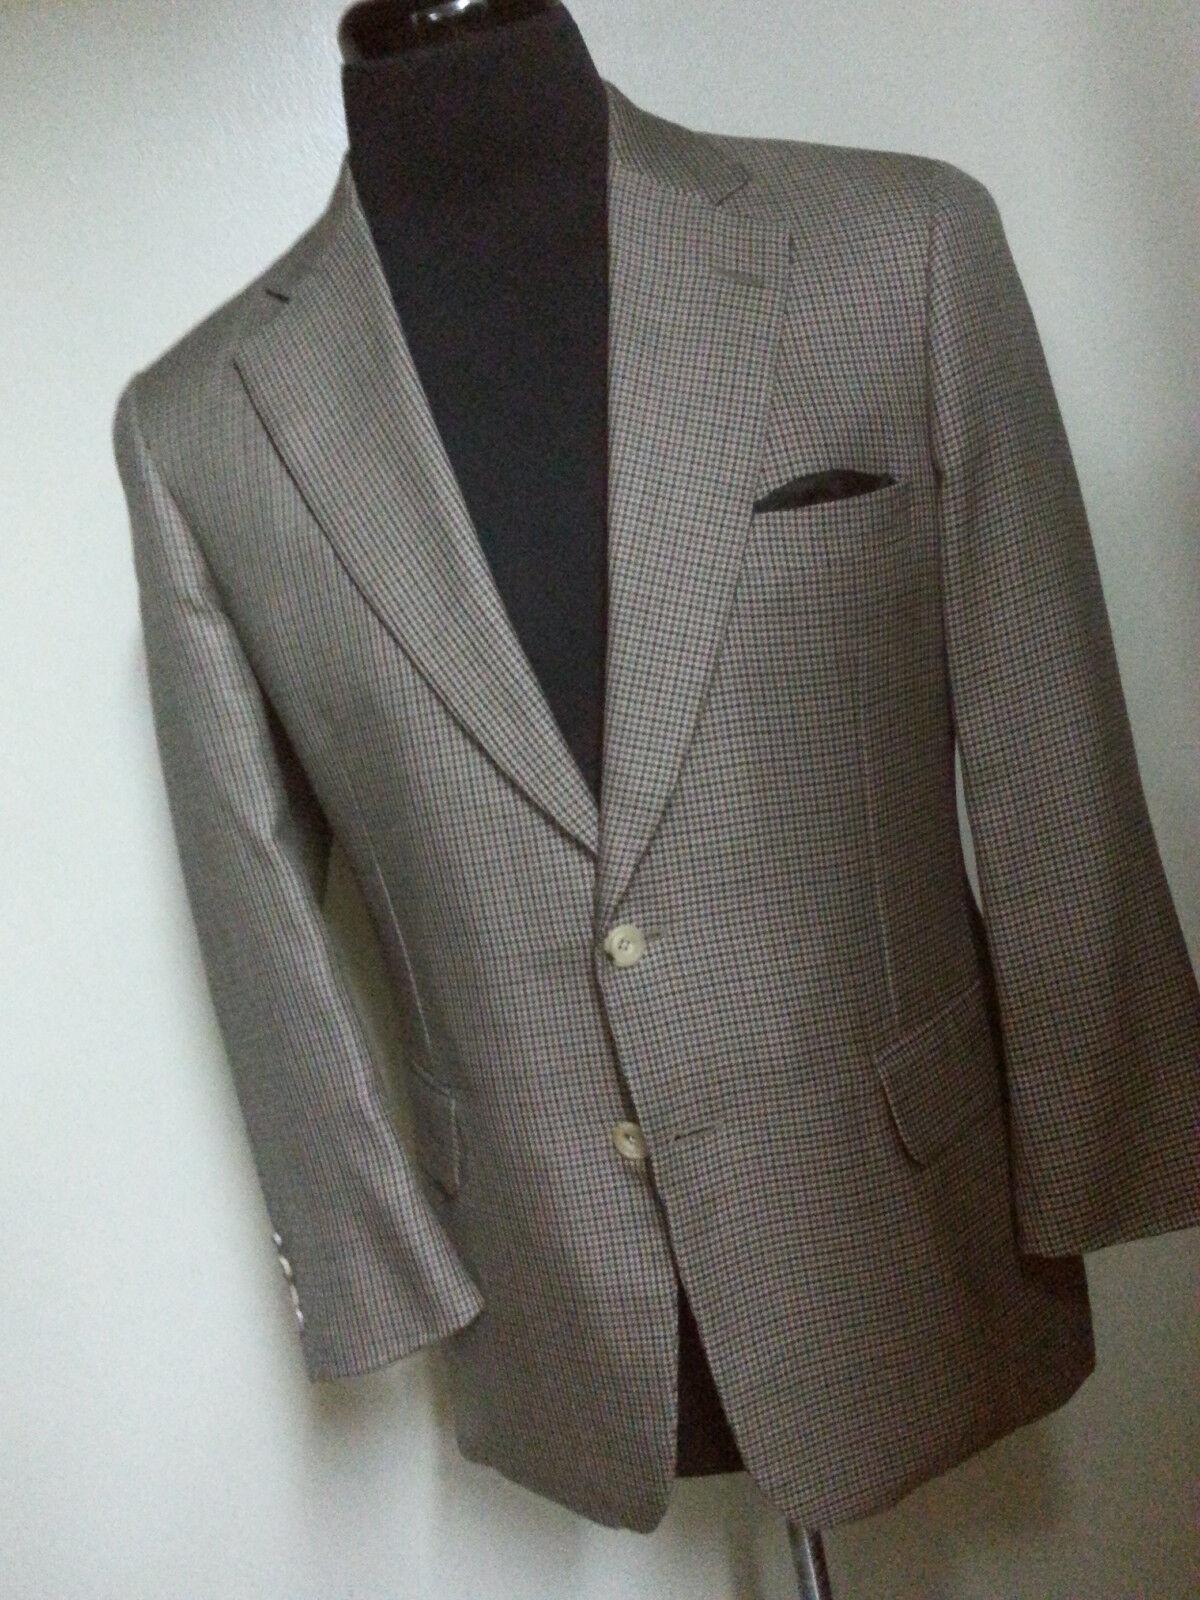 PAUL STUART Tweed  Sport coat 2 Btn Center Vent  100% Wool 42 Short - Fit 42 Reg